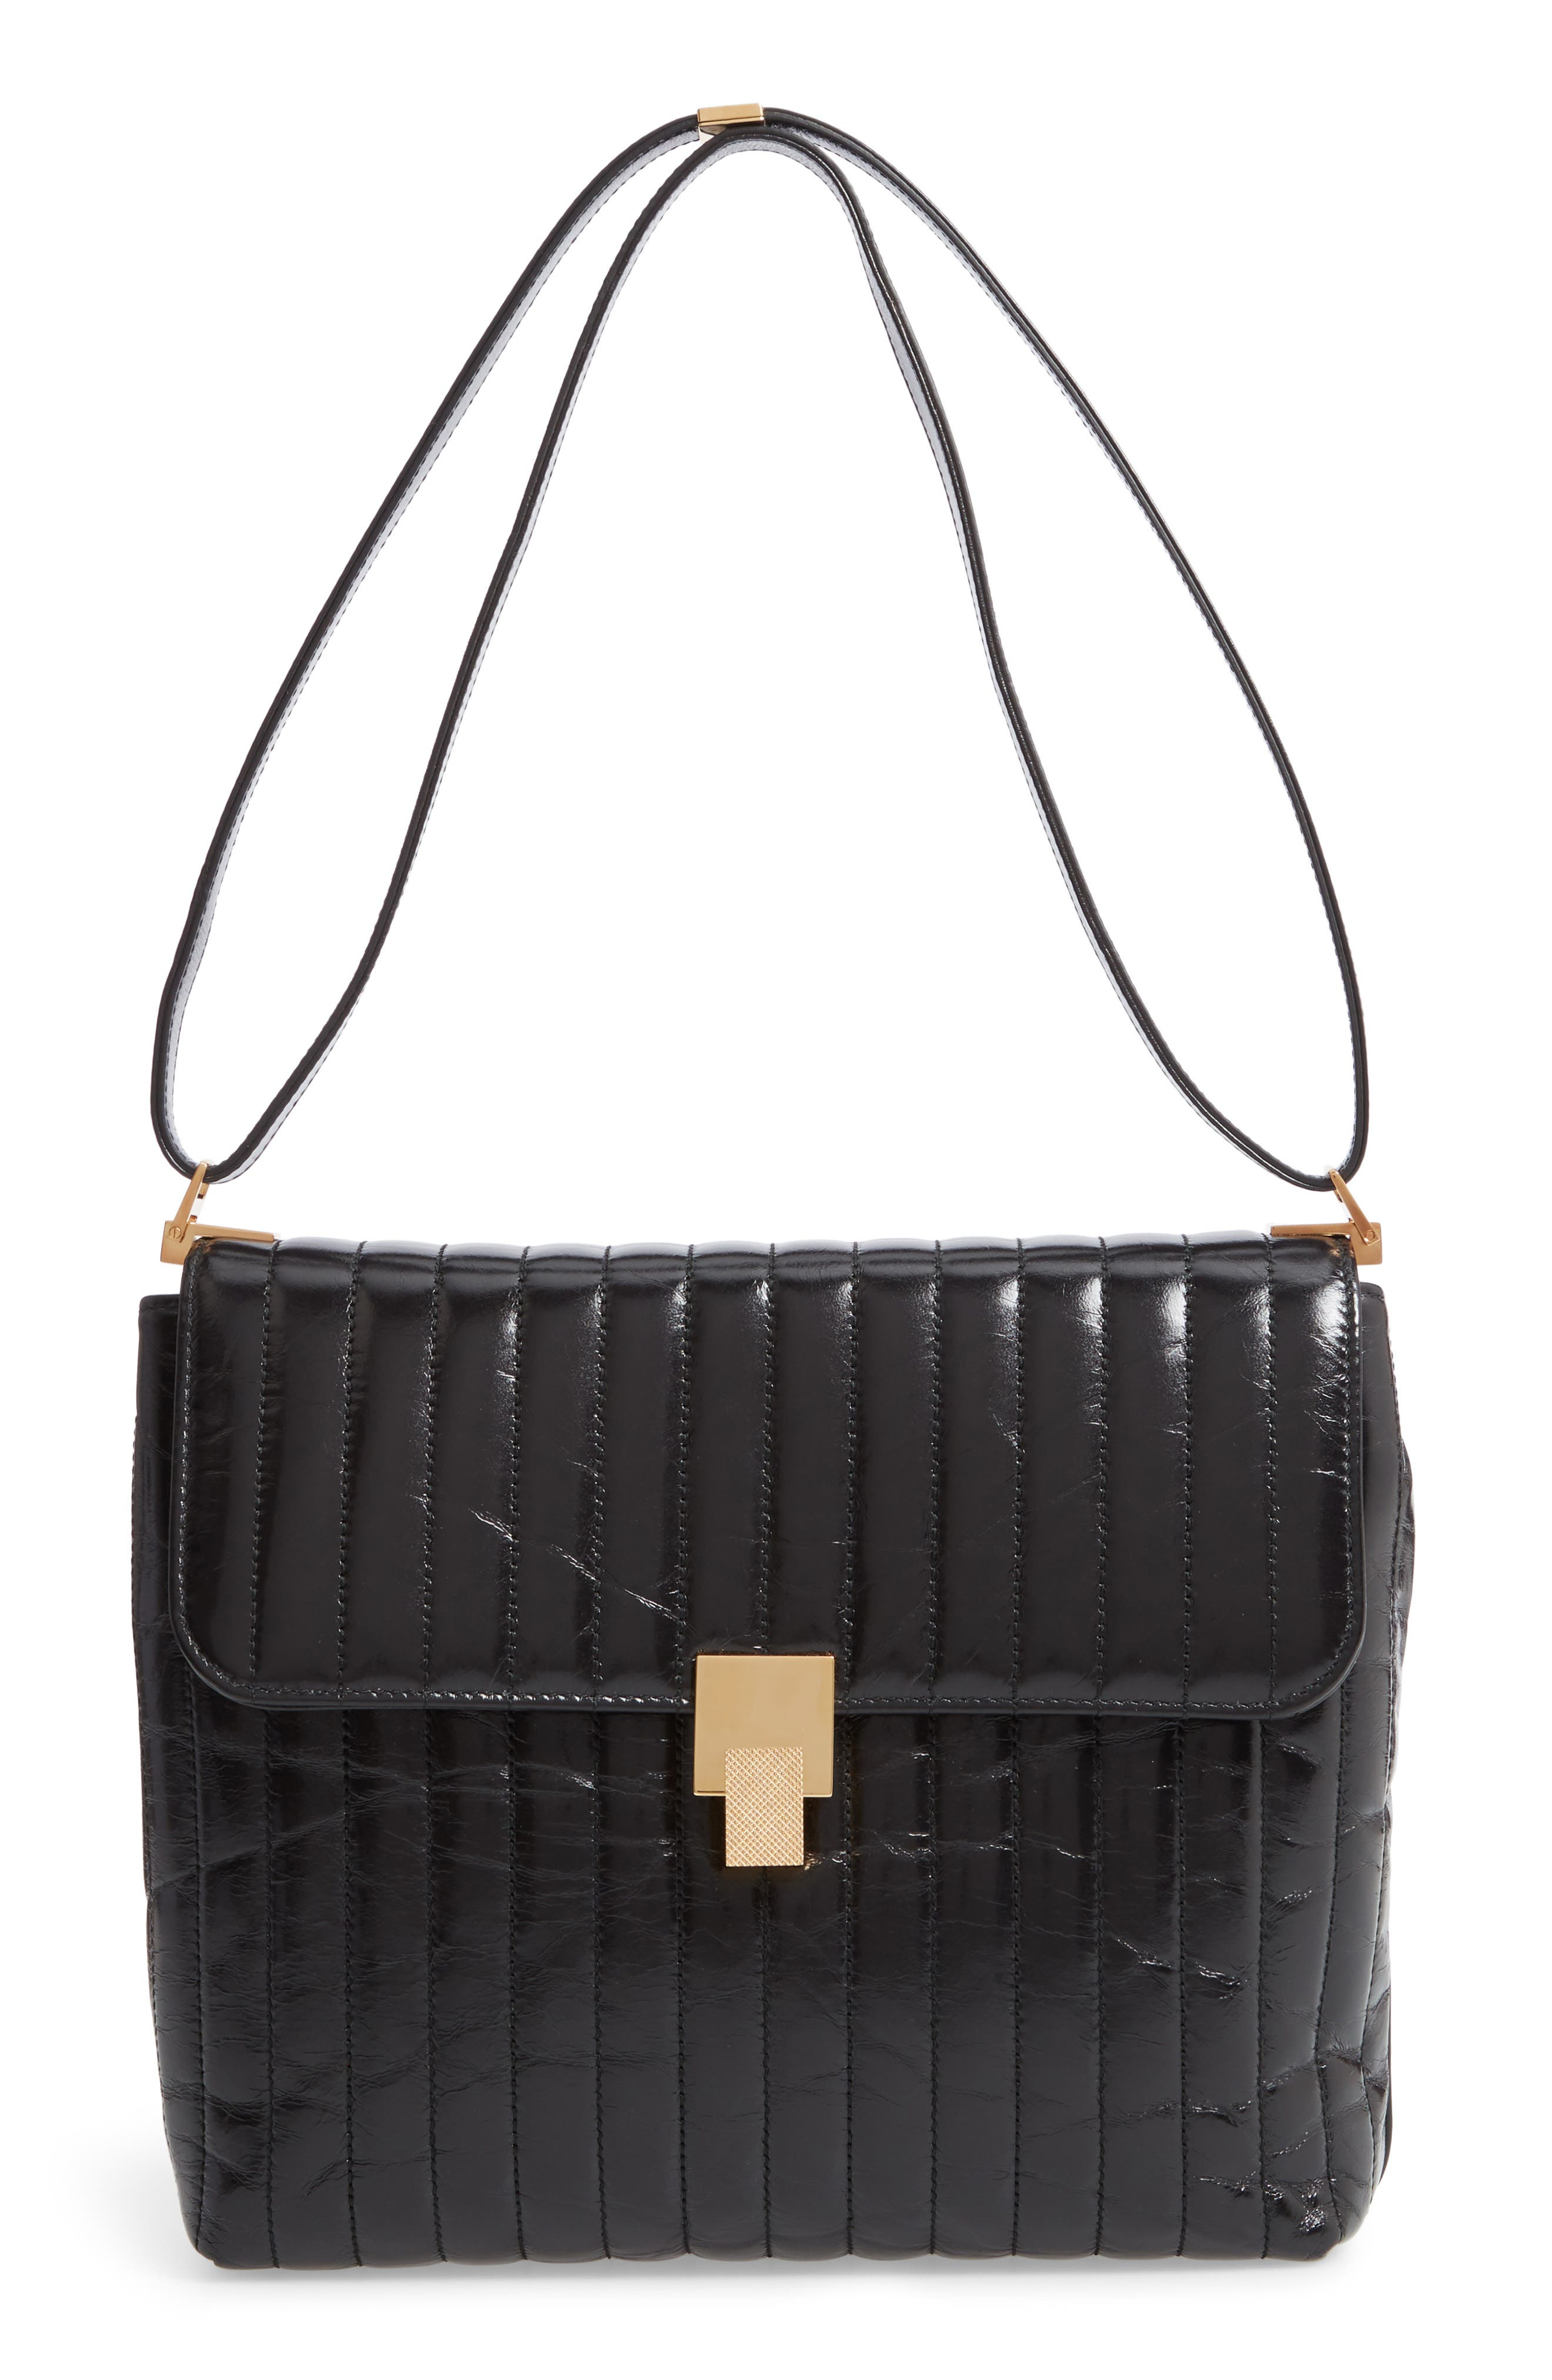 VICTORIA BECKHAM Quinton Quilted Leather Shoulder Bag, Main, color, 001